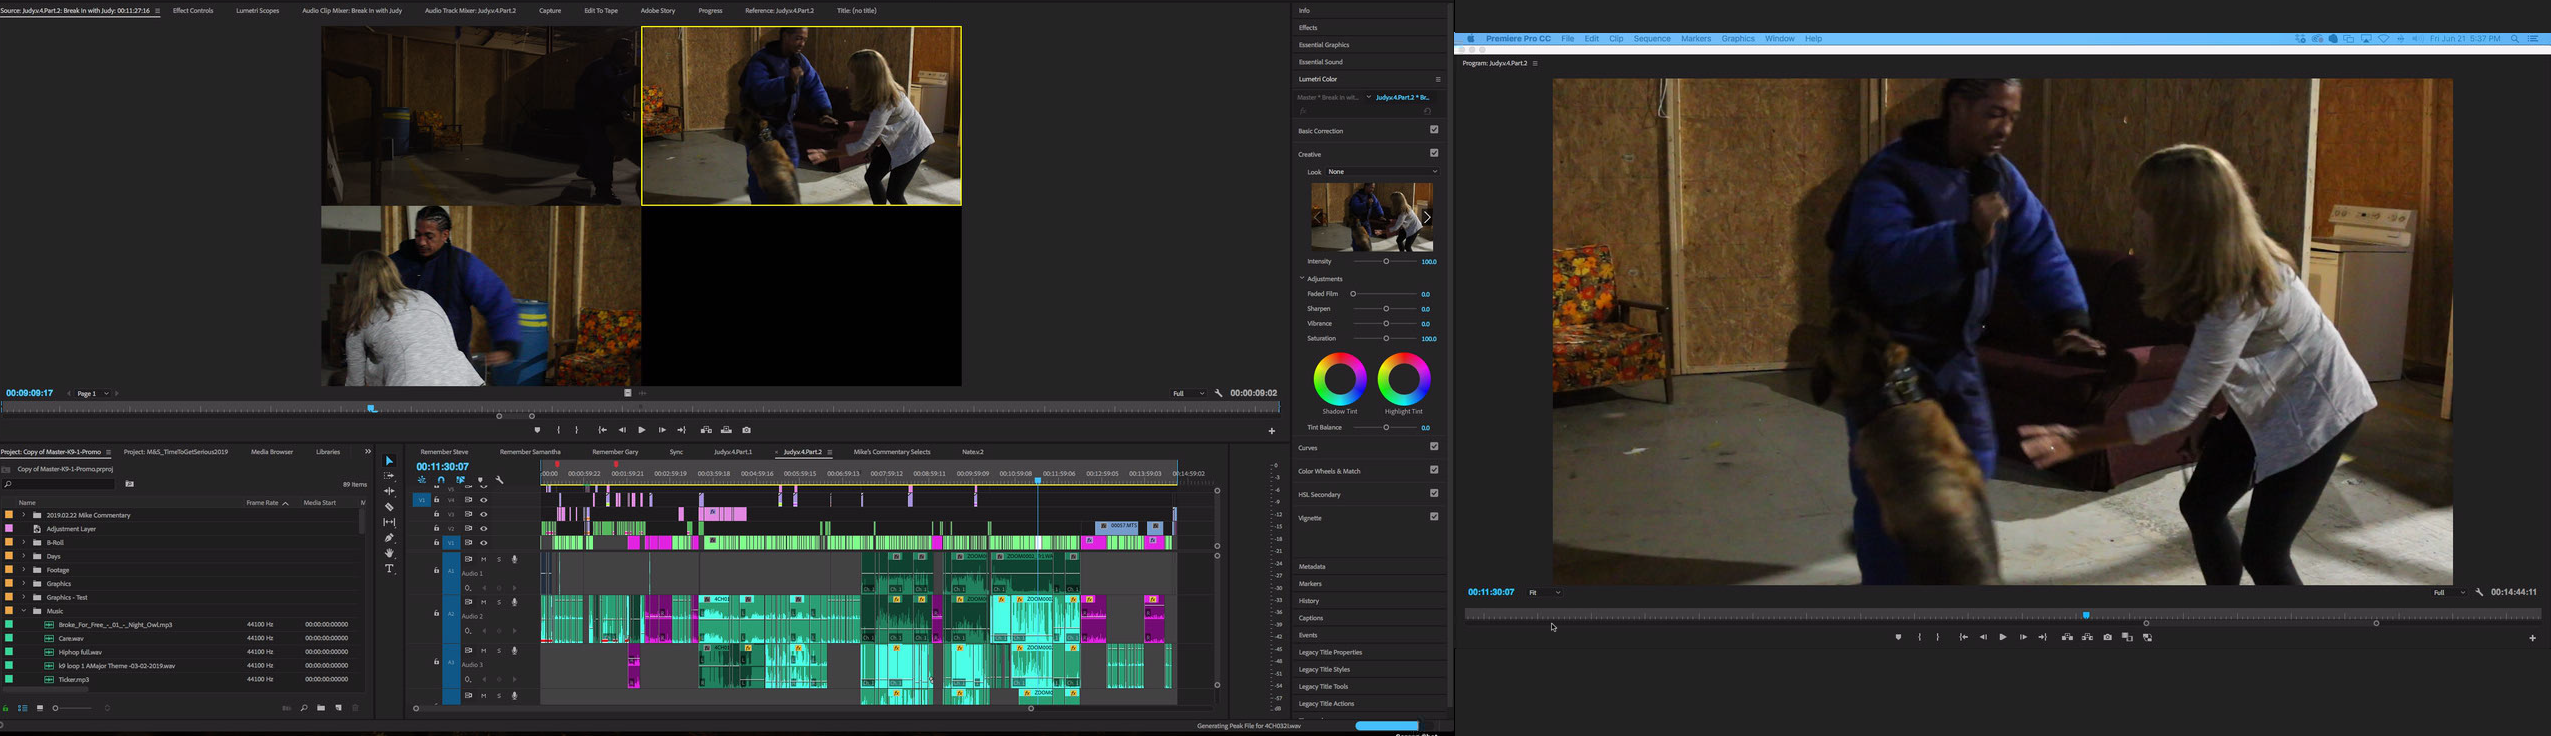 editing post production